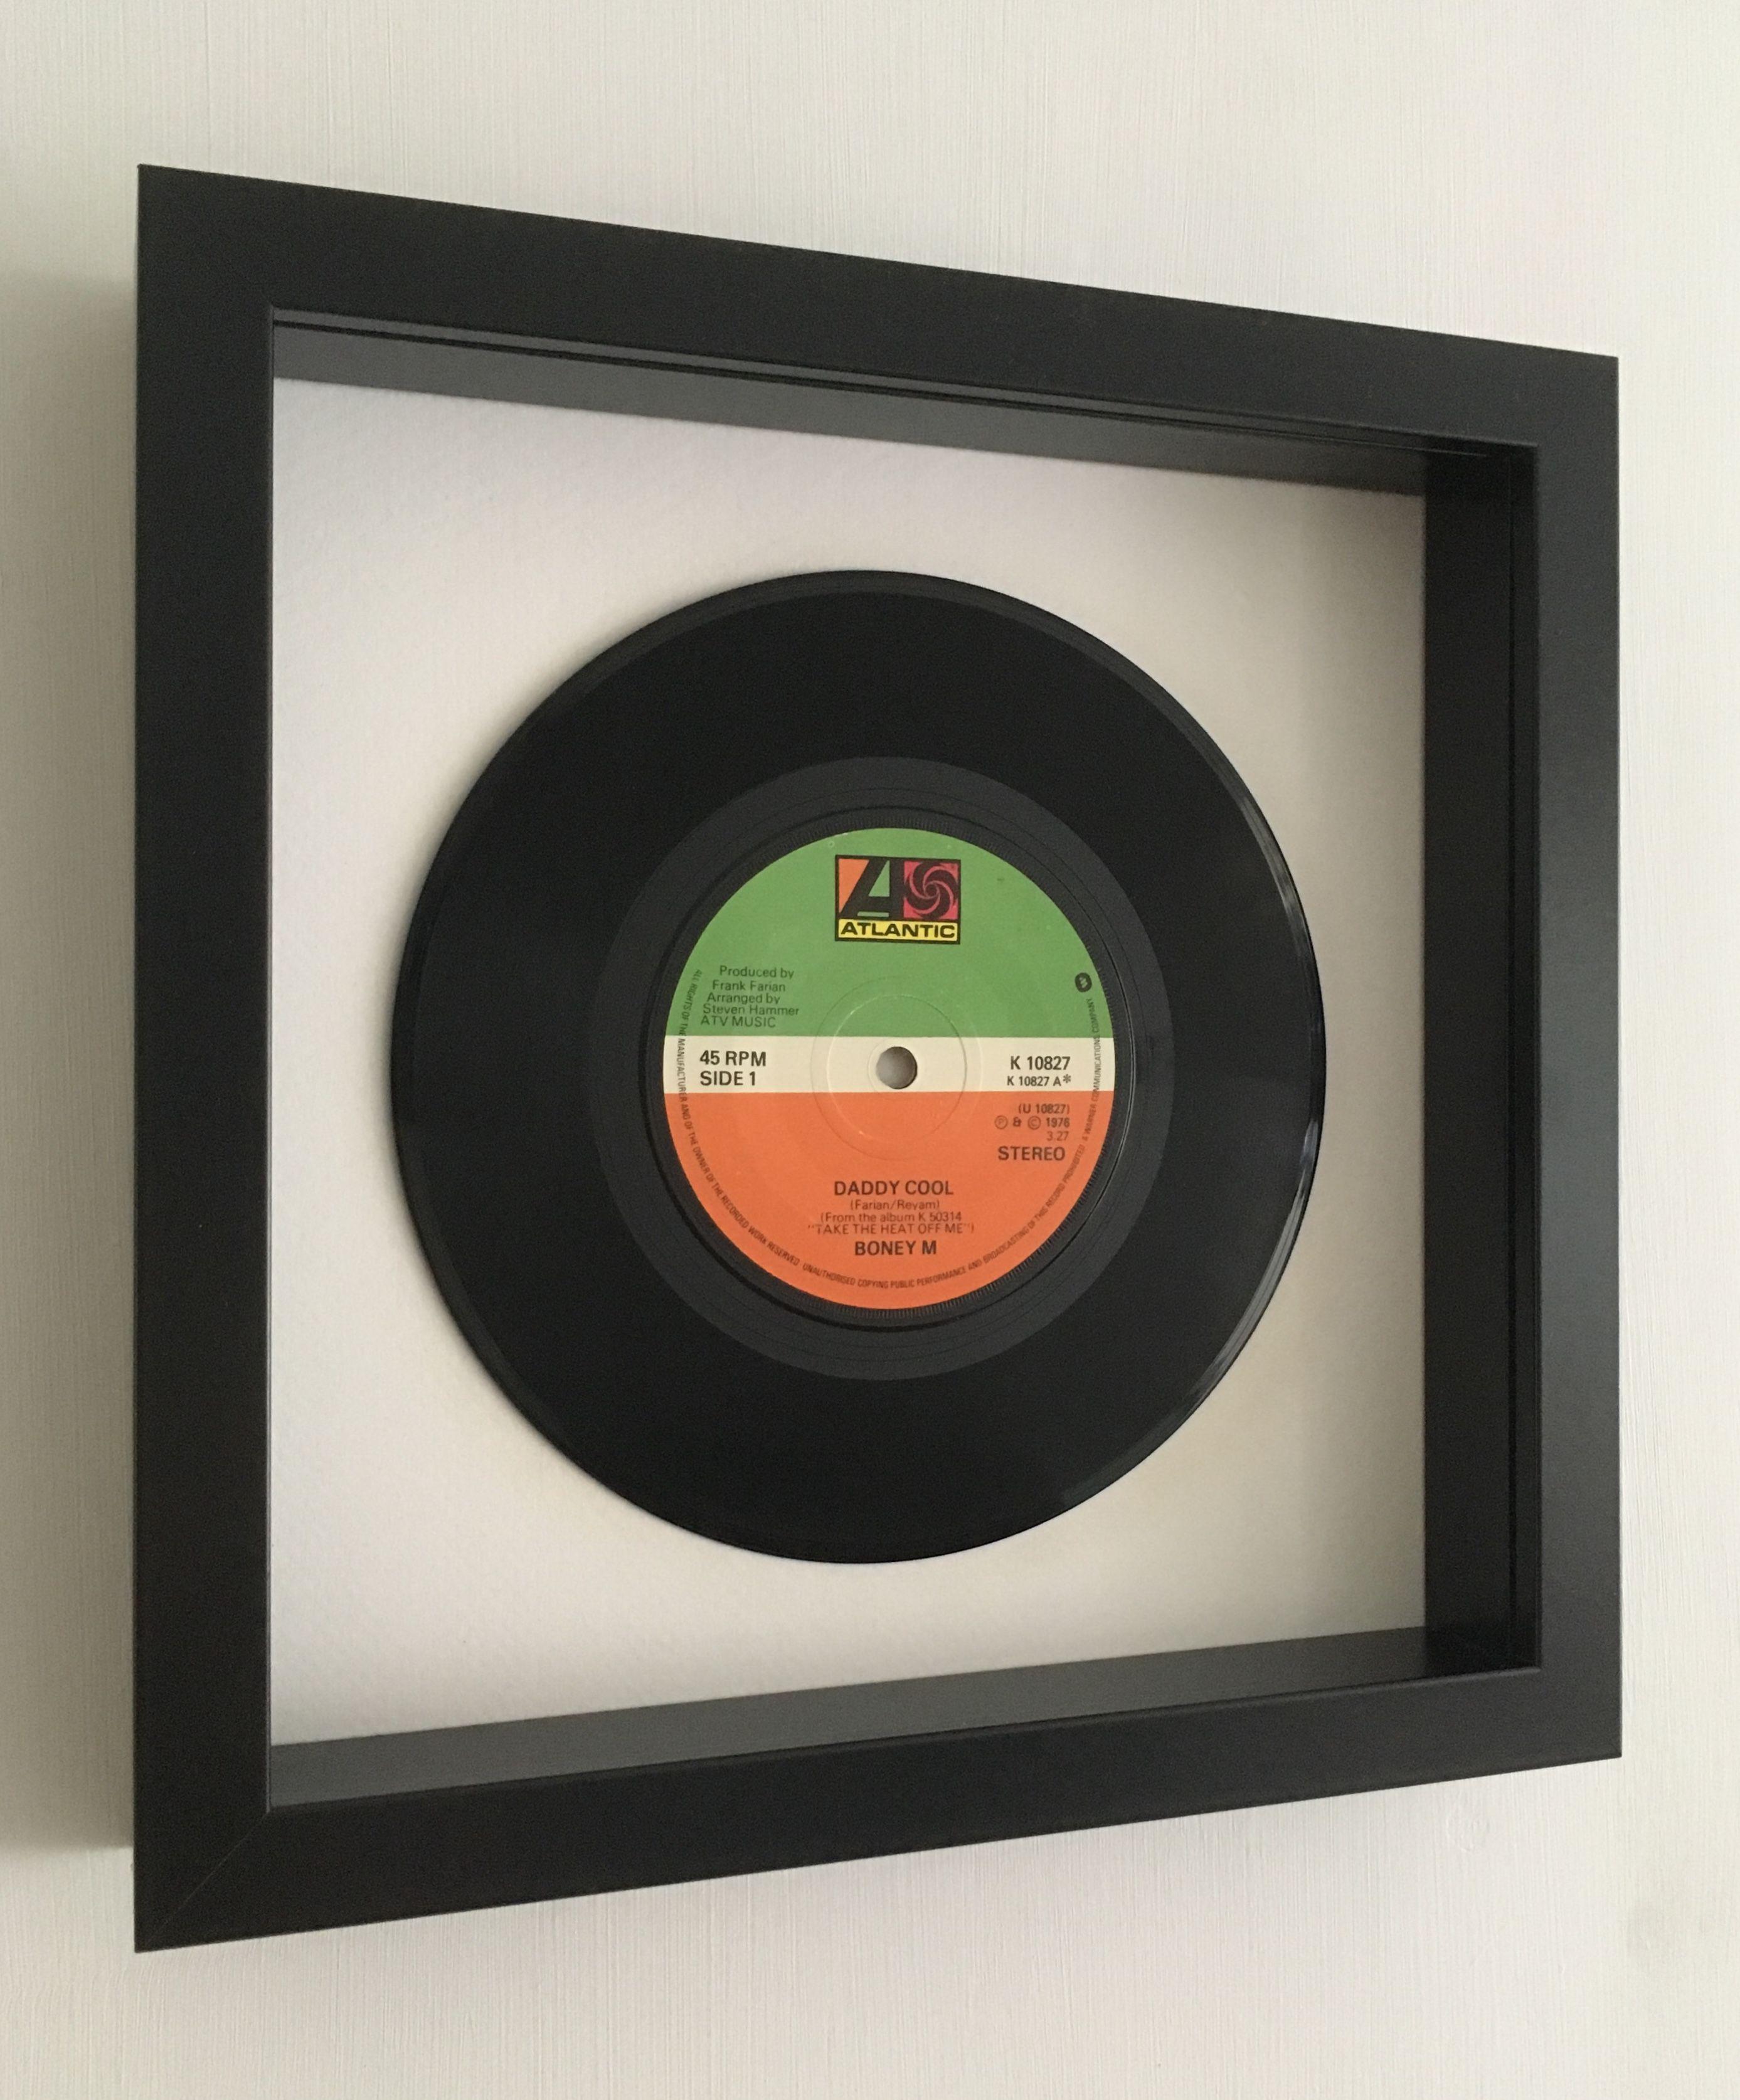 Fathers Day Gift Idea Boney M Daddy Cool Framed Vinyl Record Vinyl Records Vinyl Box Frames